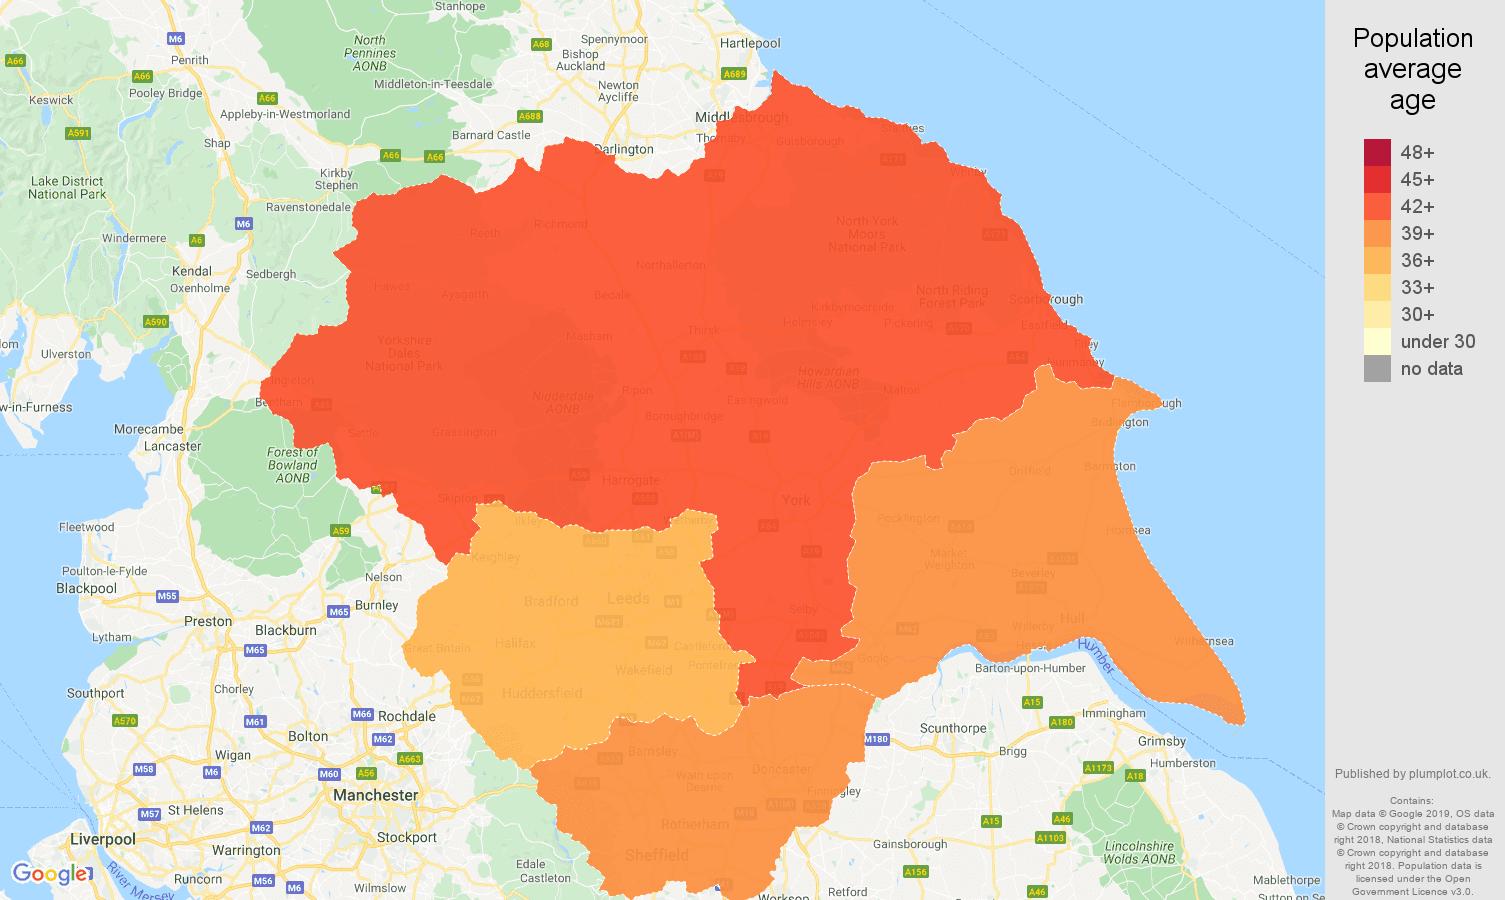 Yorkshire population average age map